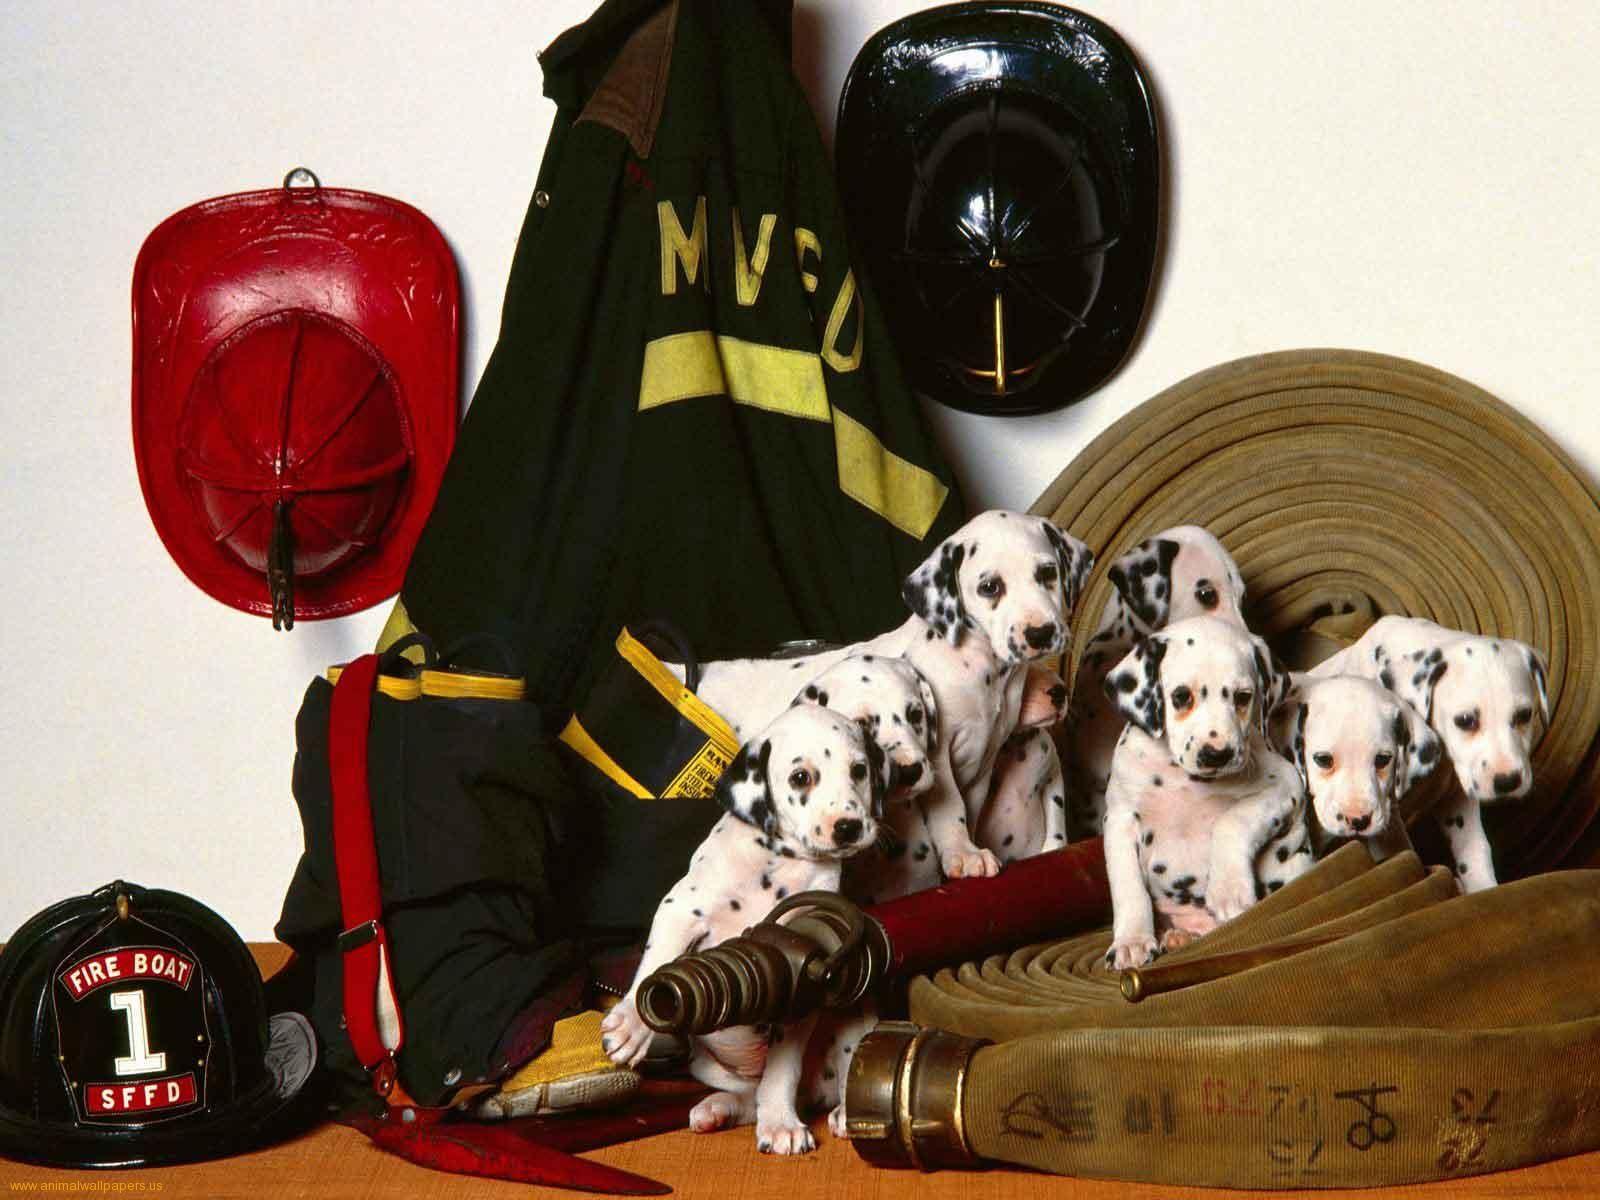 Dalmatian Puppies As Firefighters Dalmatian Puppy Dalmatian